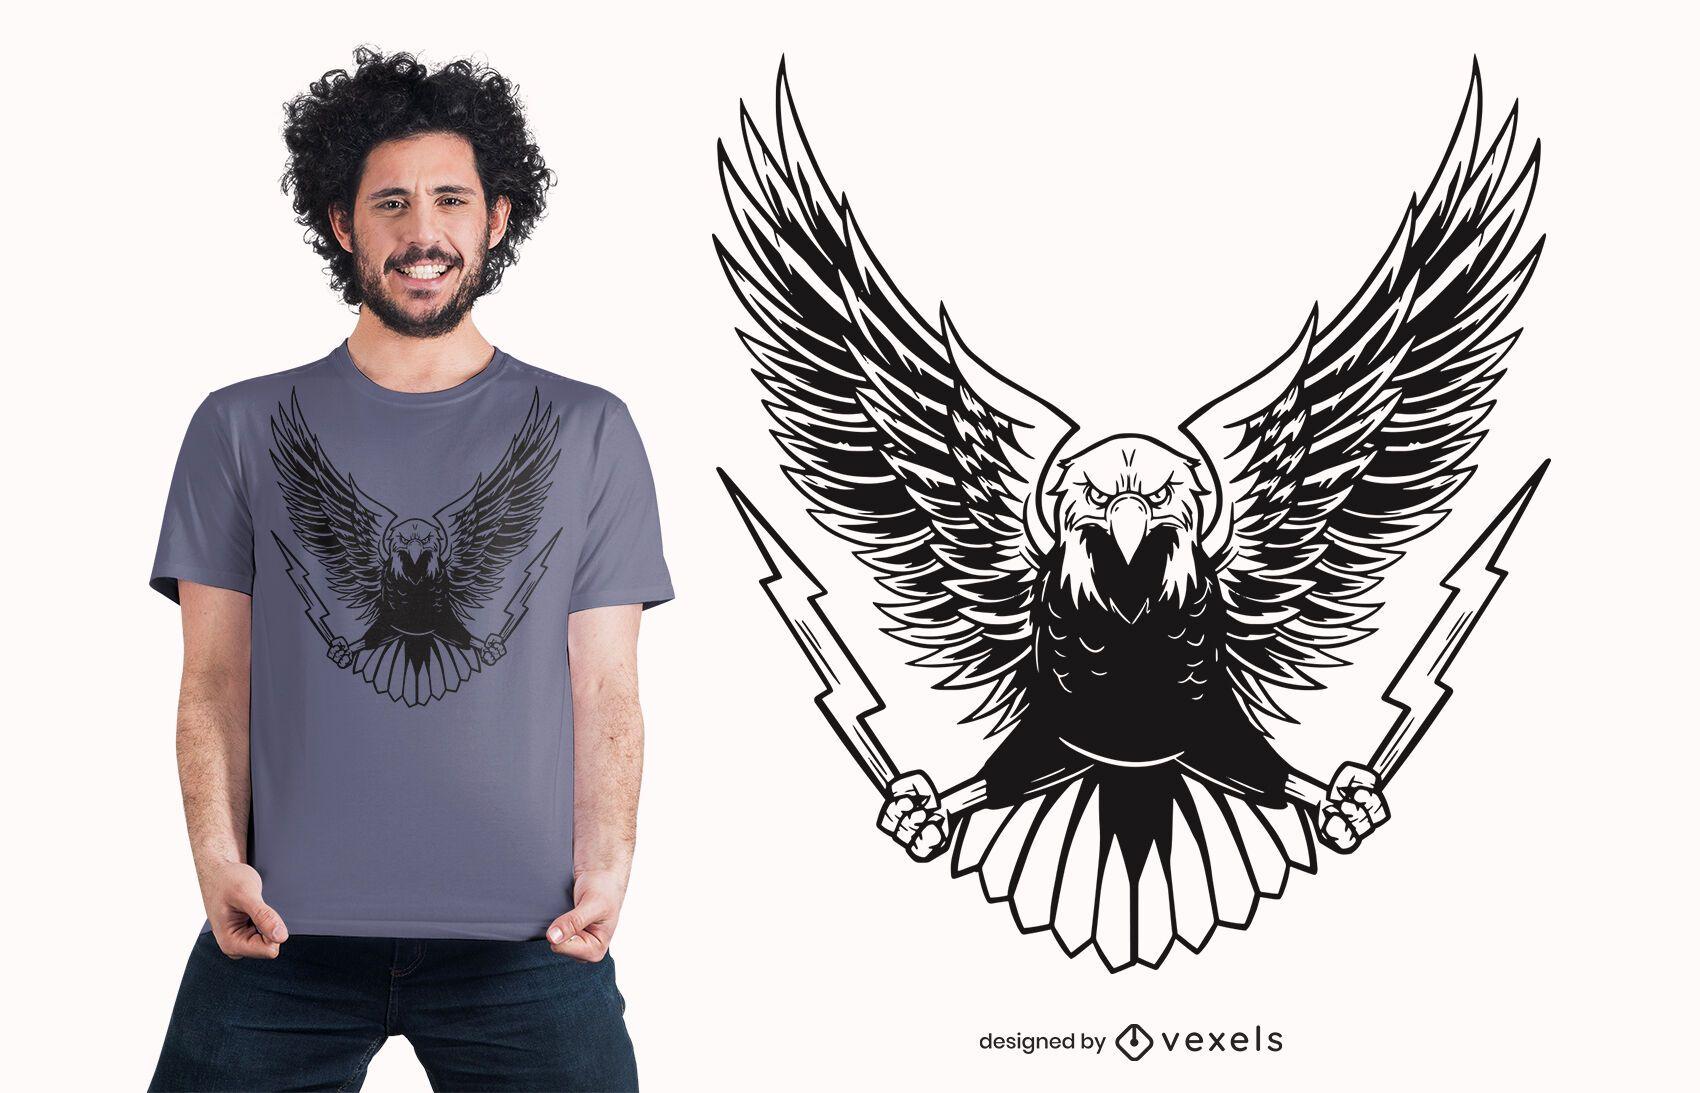 Angry eagle t-shirt design